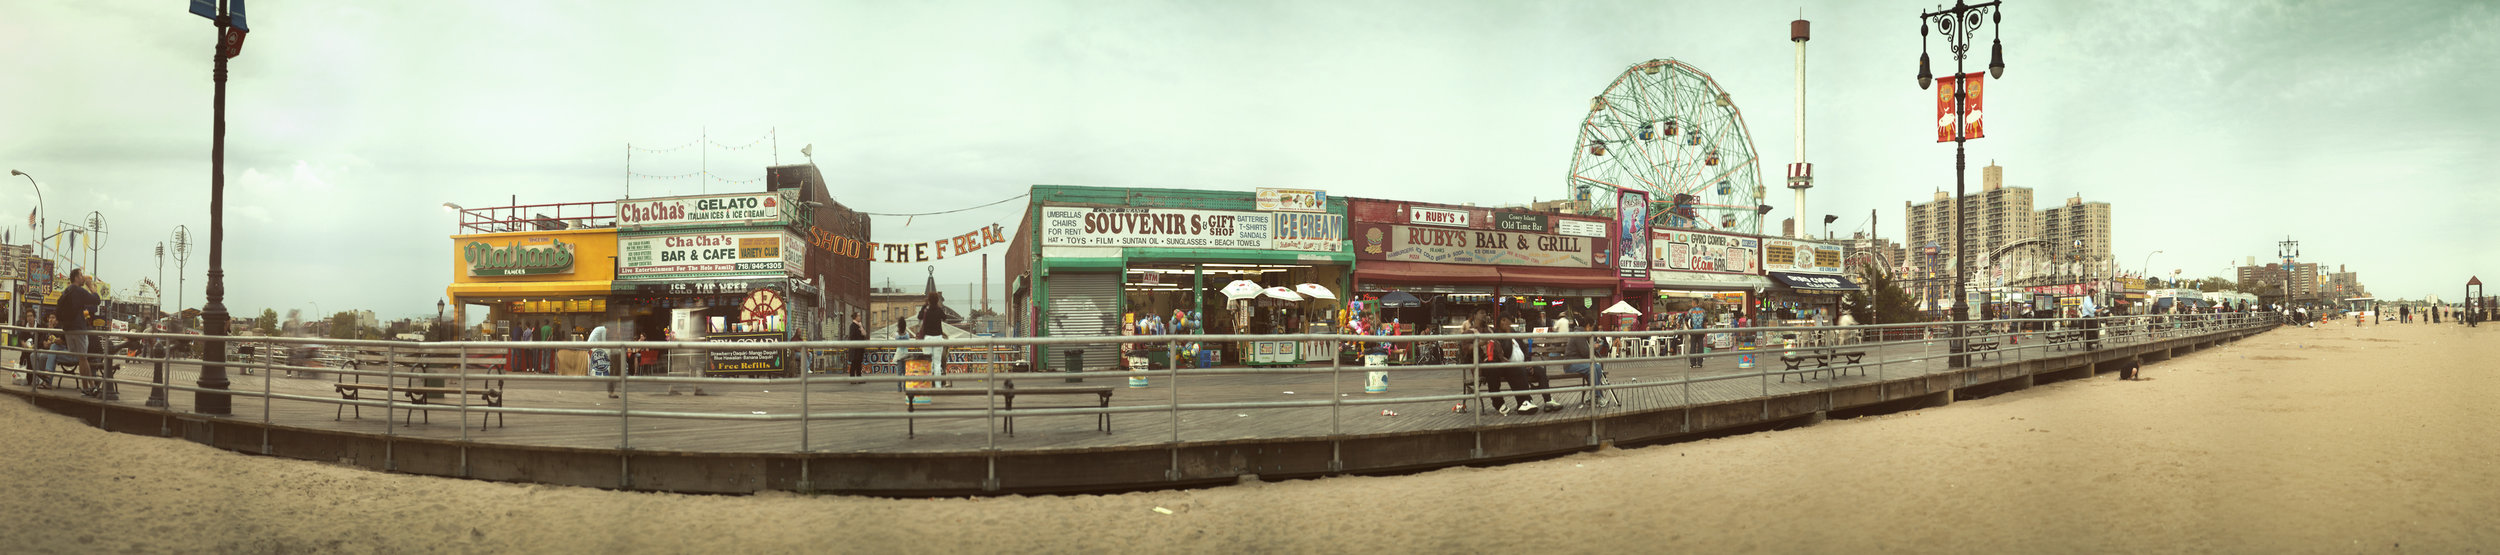 Coney Island-10.jpg